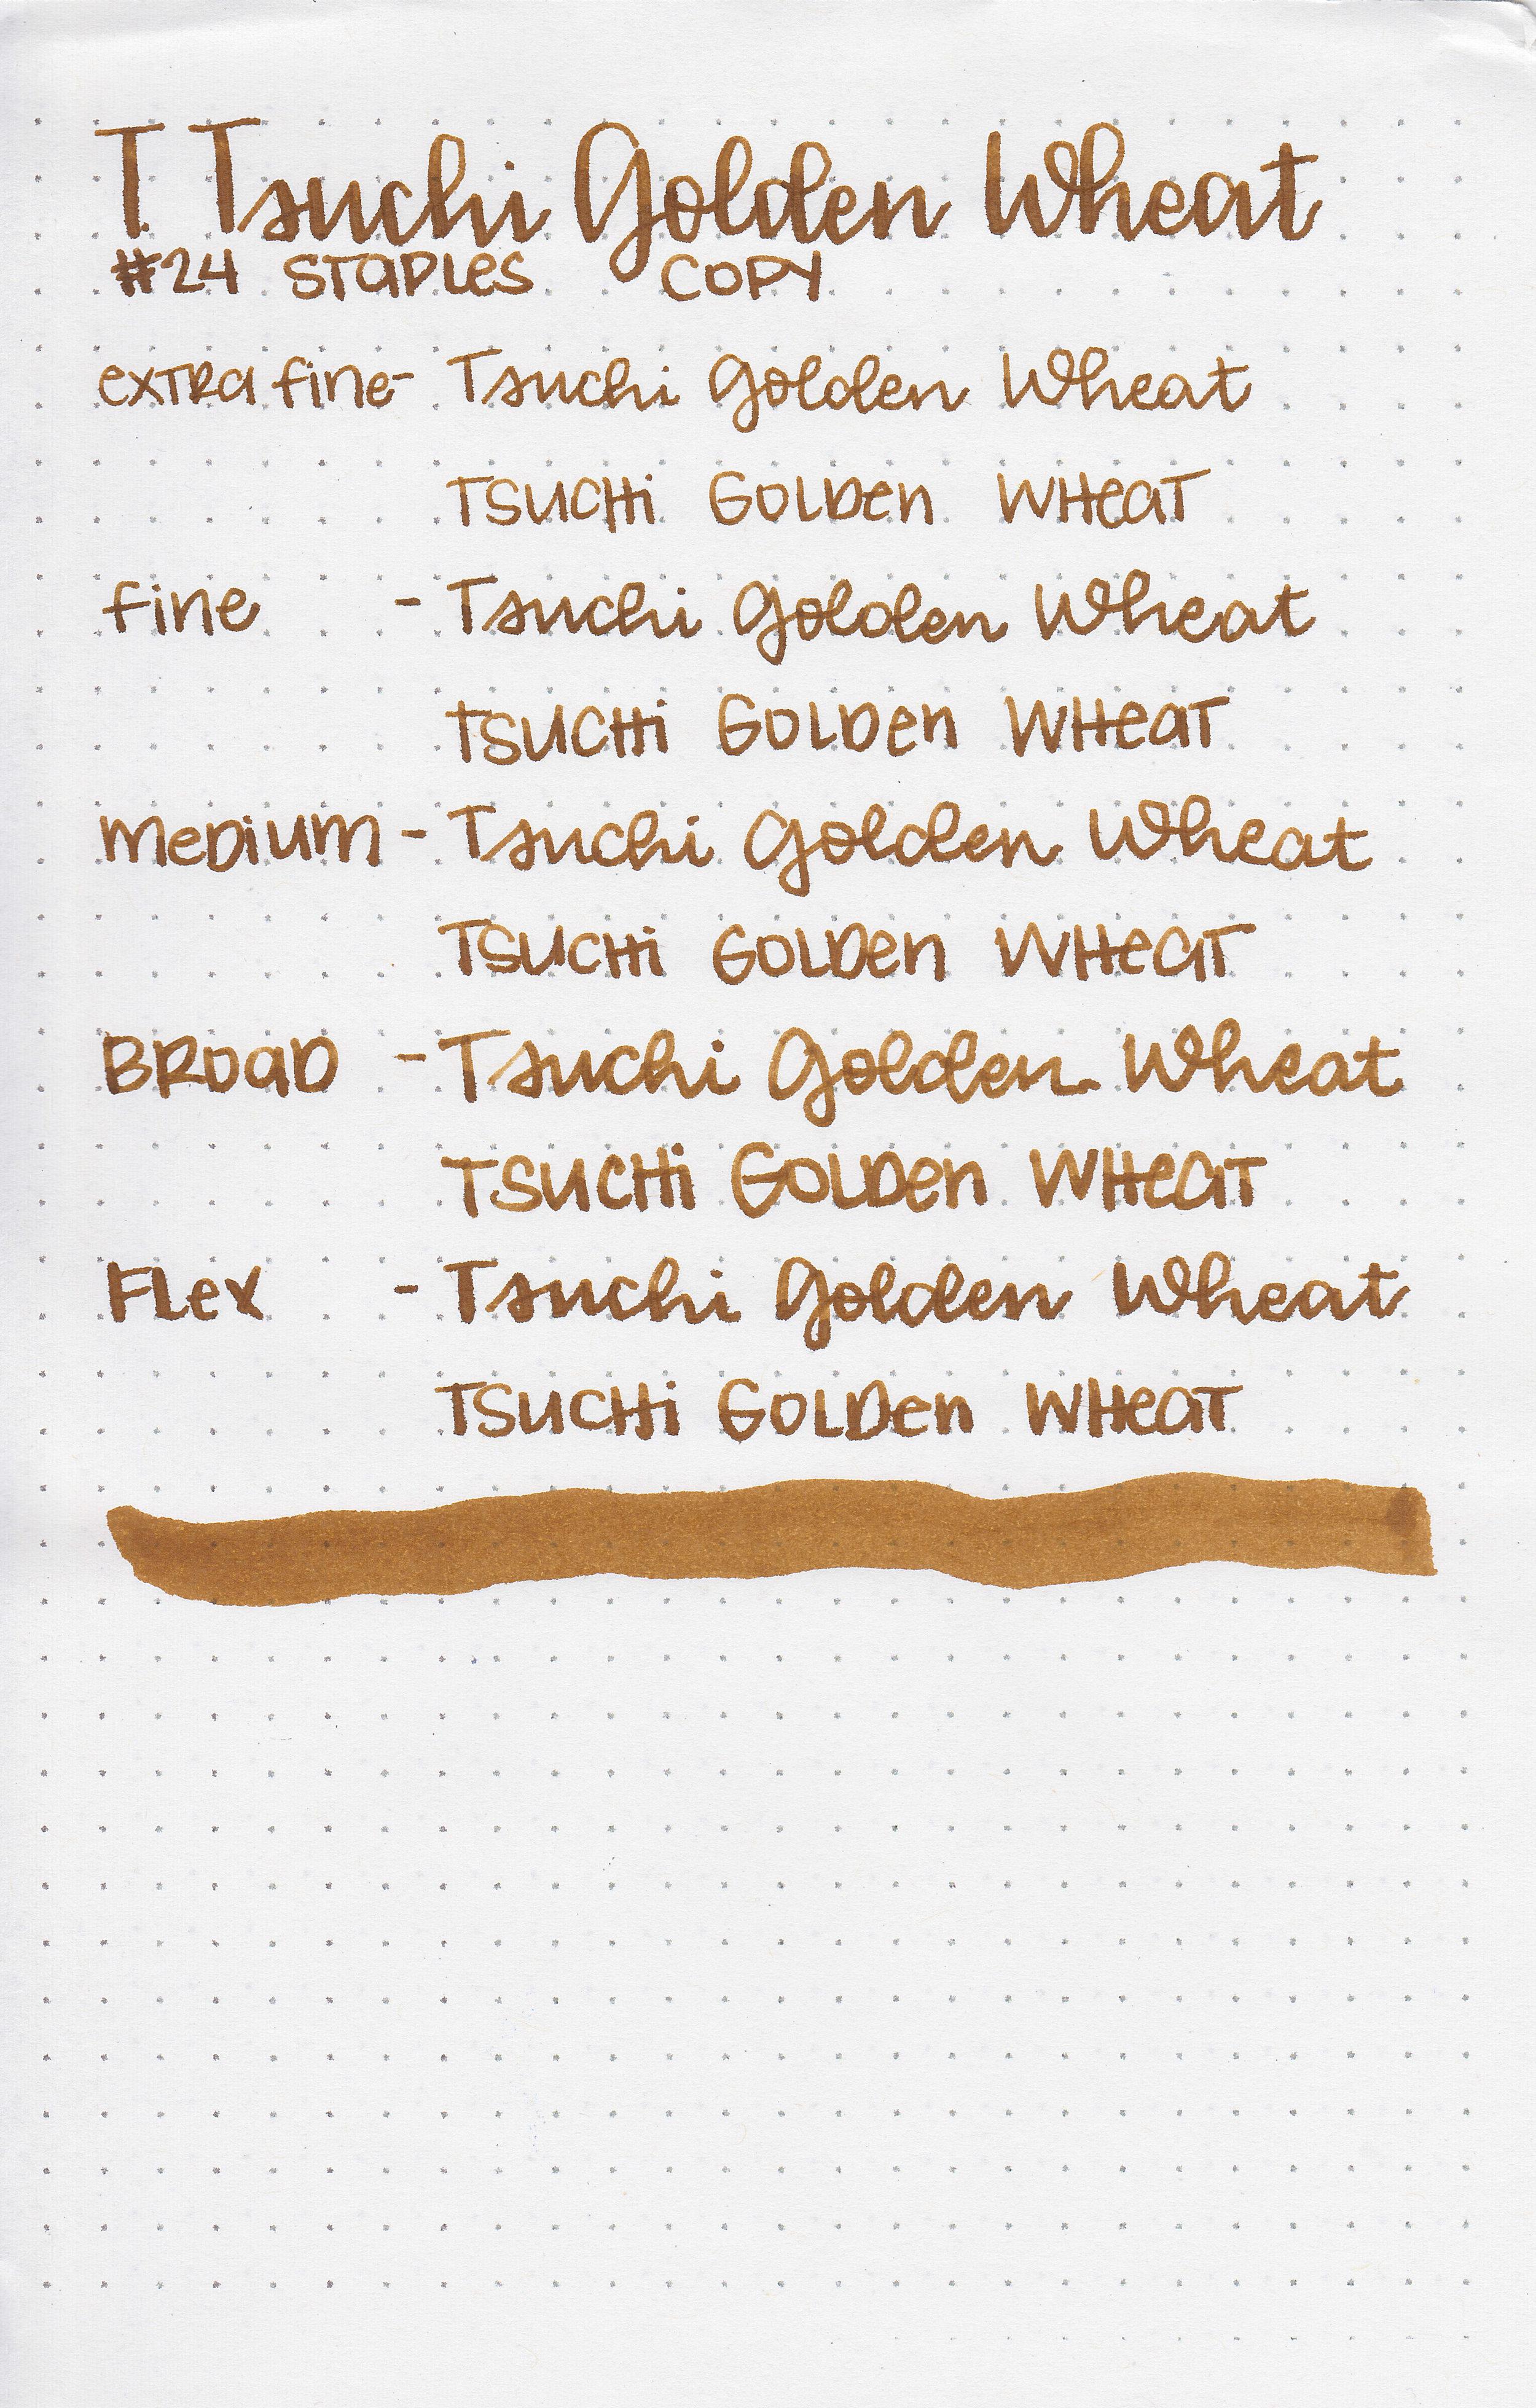 tac-tsuchi-golden-wheat-11.jpg